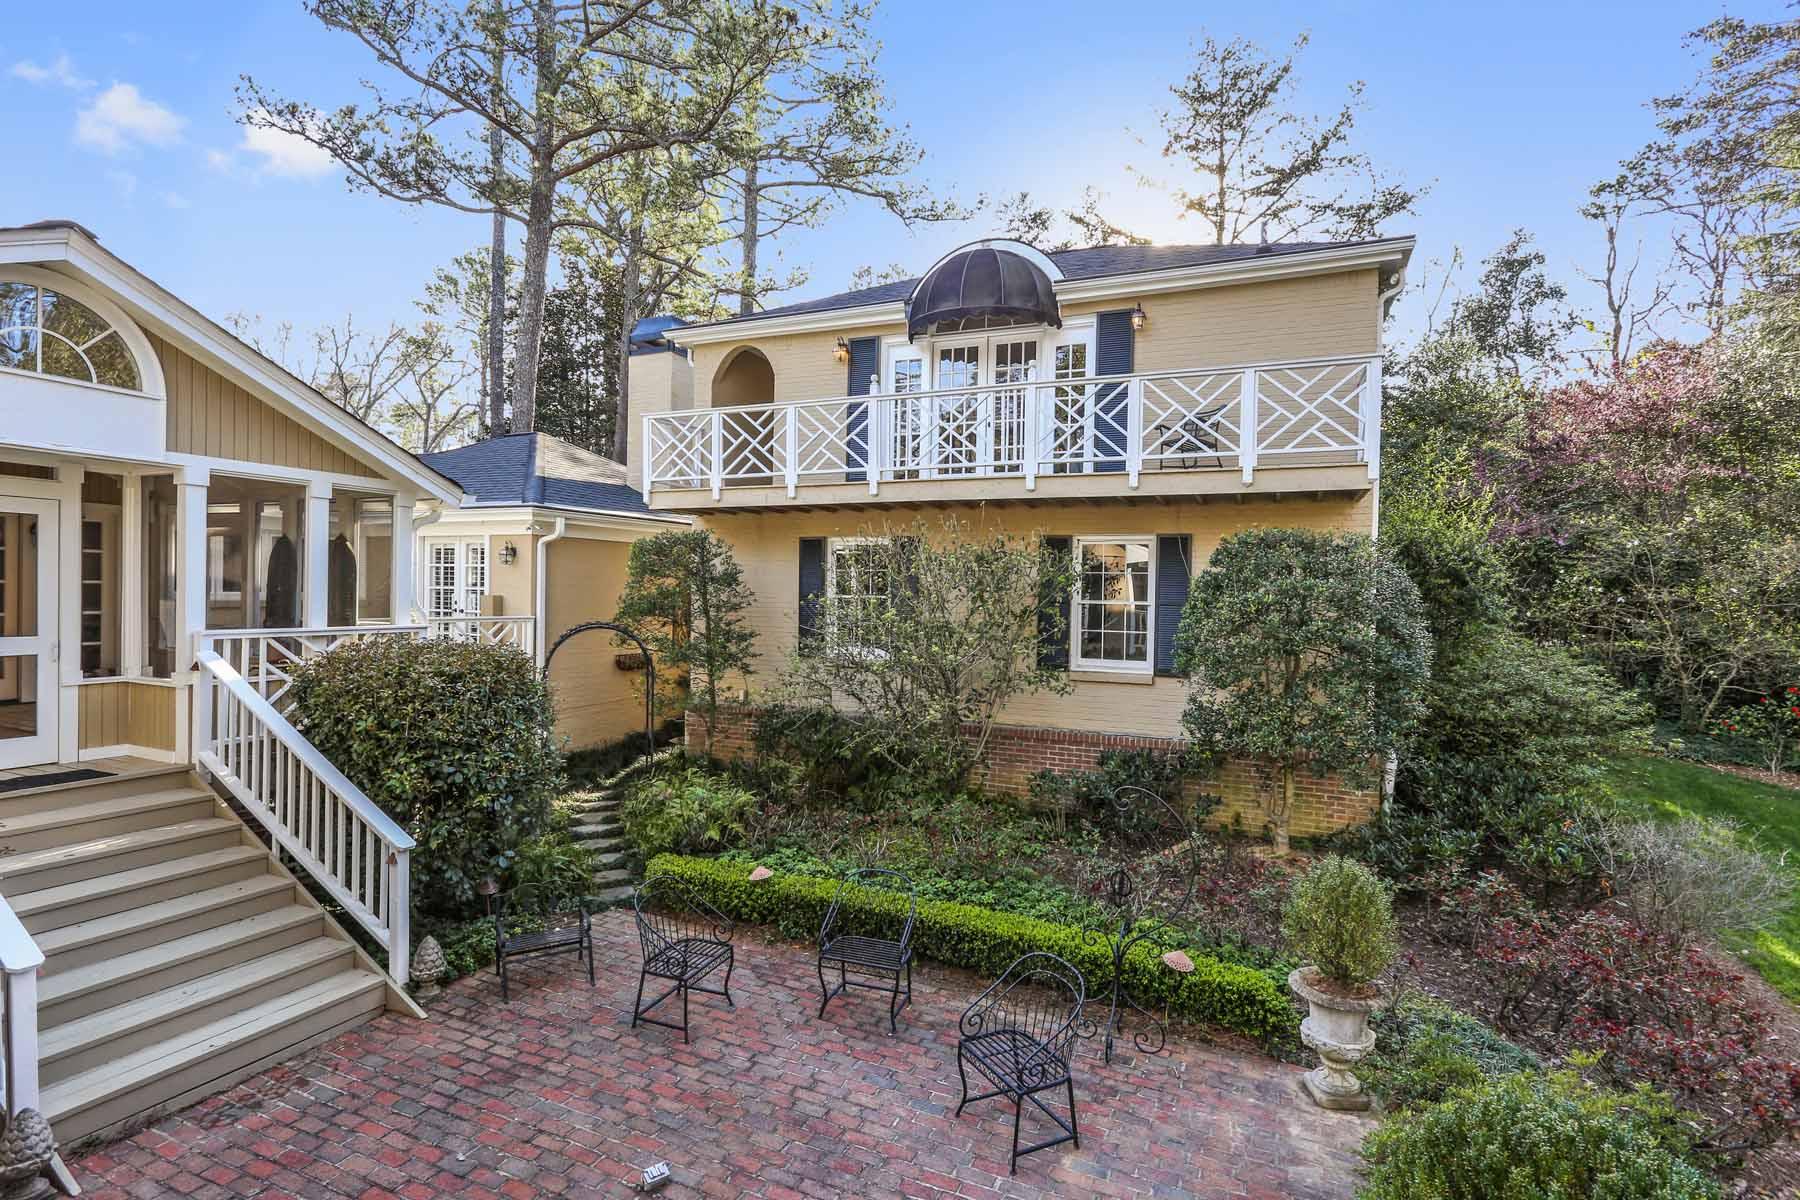 Single Family Home for Sale at Old Buckhead Charm 3038 Nancy Creek Road Atlanta, Georgia, 30327 United States